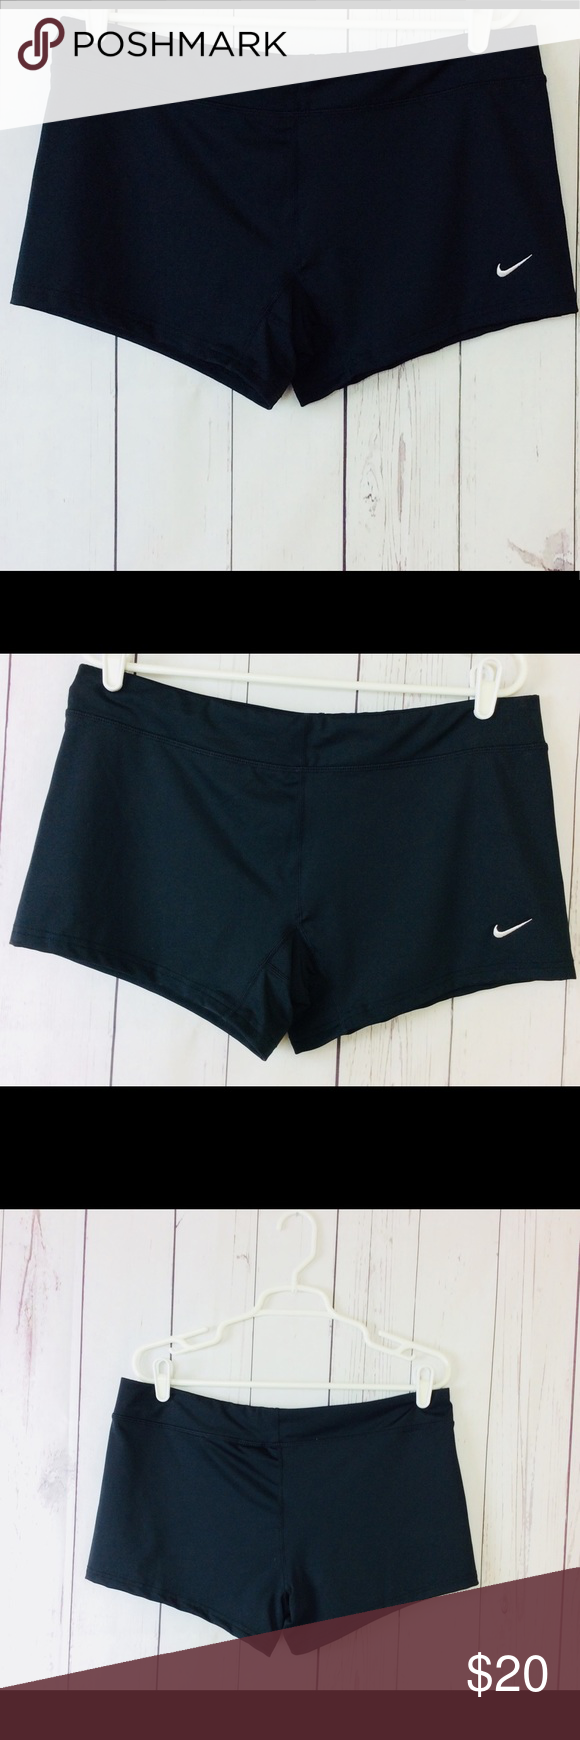 Nike Performance Women S Volleyball Spandex Shorts Nwt Volleyball Spandex Volleyball Spandex Shorts Spandex Shorts